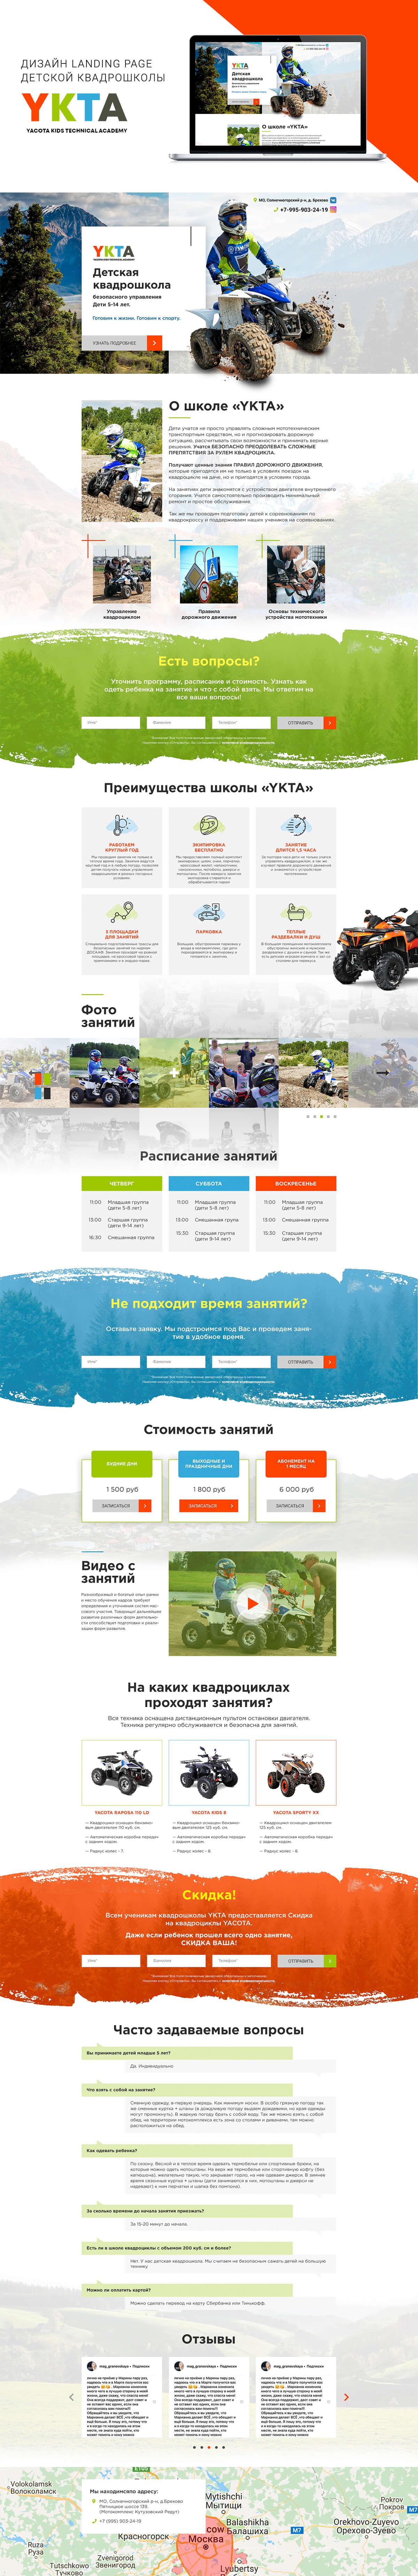 "Landing Page детской квадрошколы ""YKTA"""